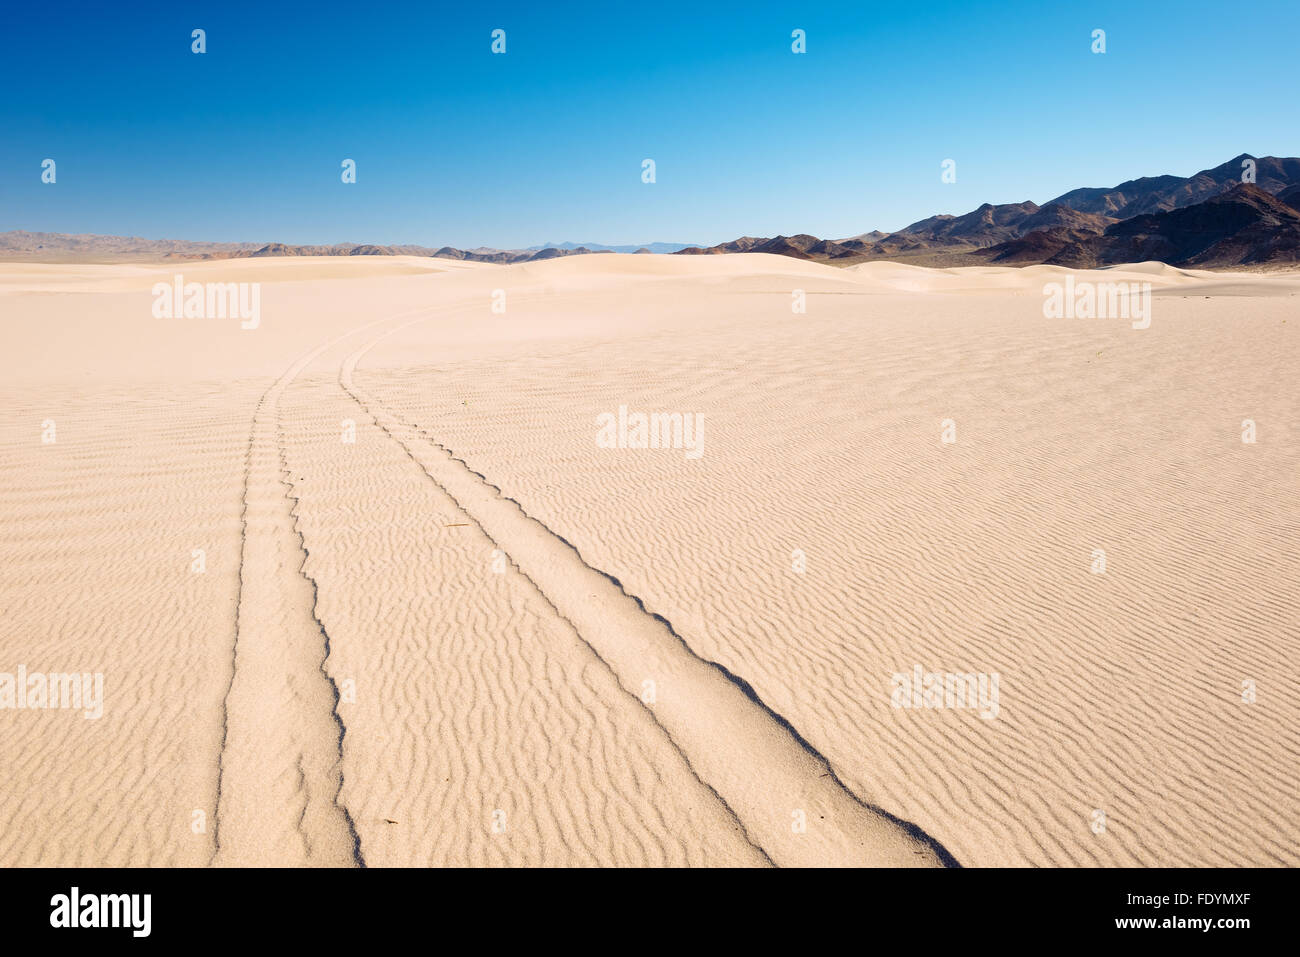 Dumont Dunes Off-Highway Vehicle Area, in the Mojave Desert of California - Stock Image